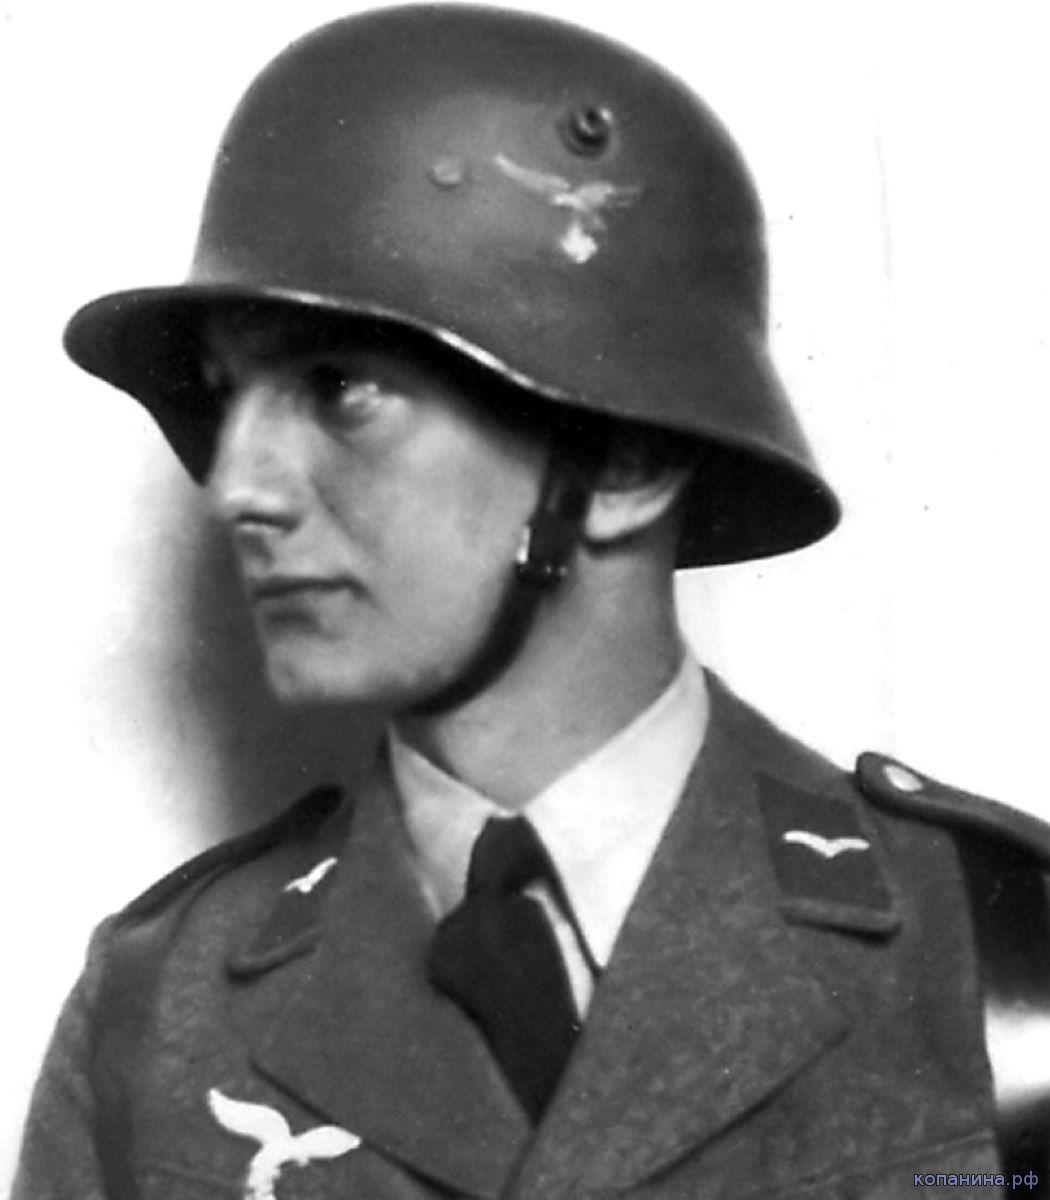 рогатые шлемы люфтваффе